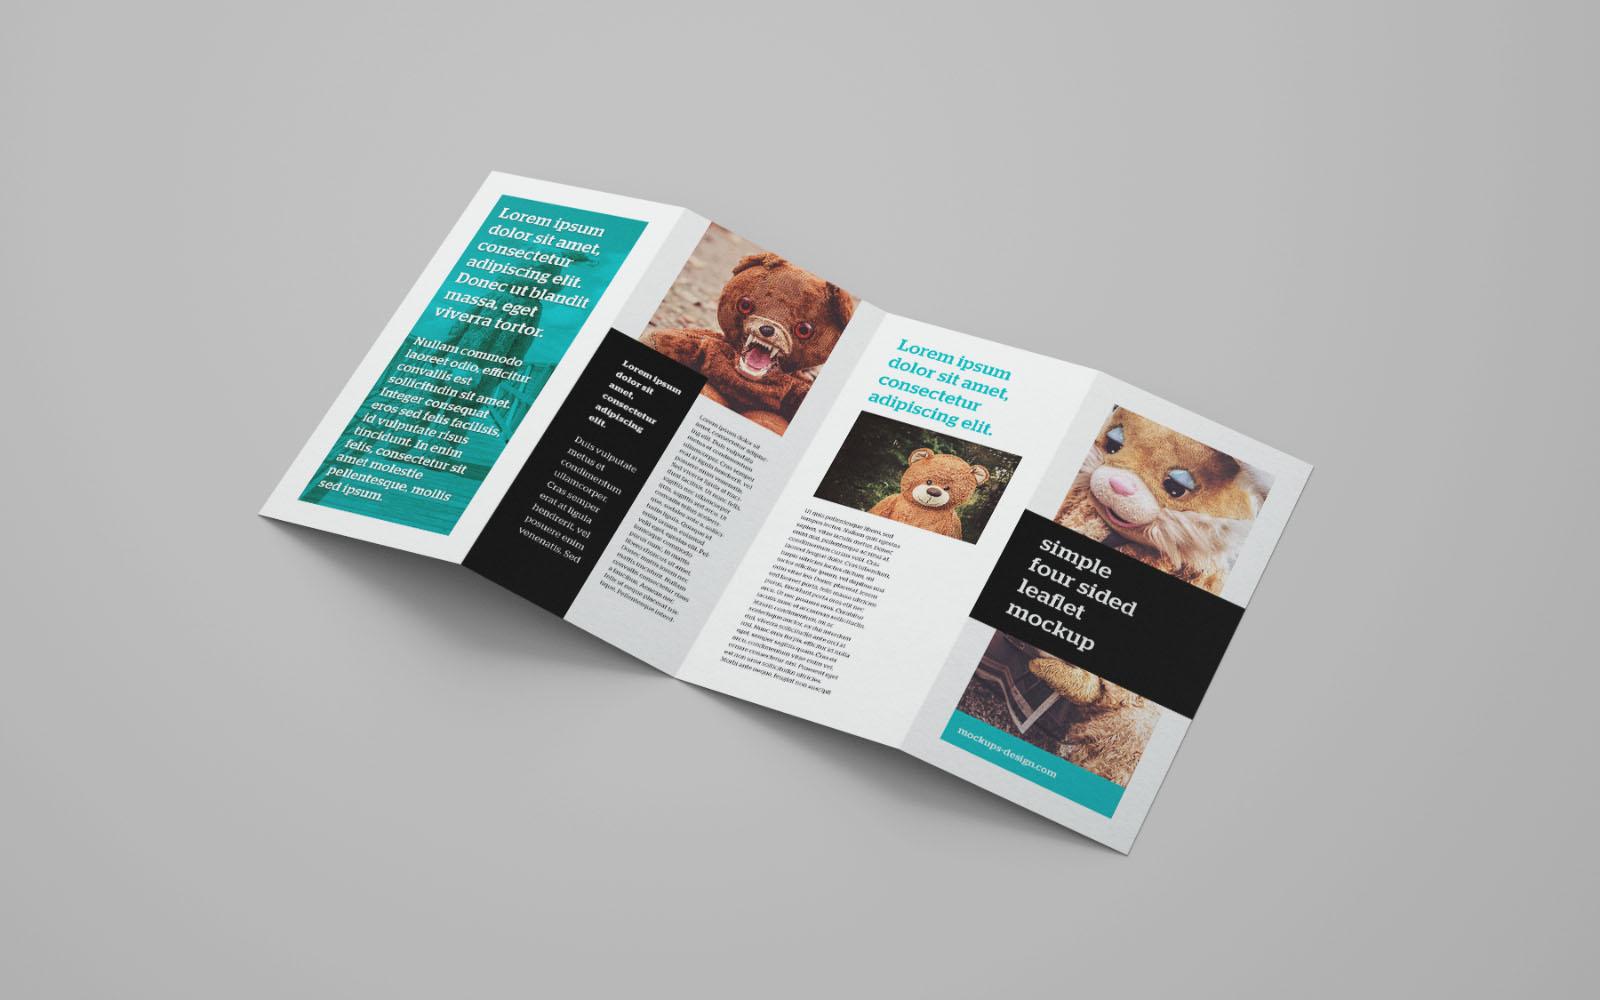 4 Panel Leaflet Brochure Mockup